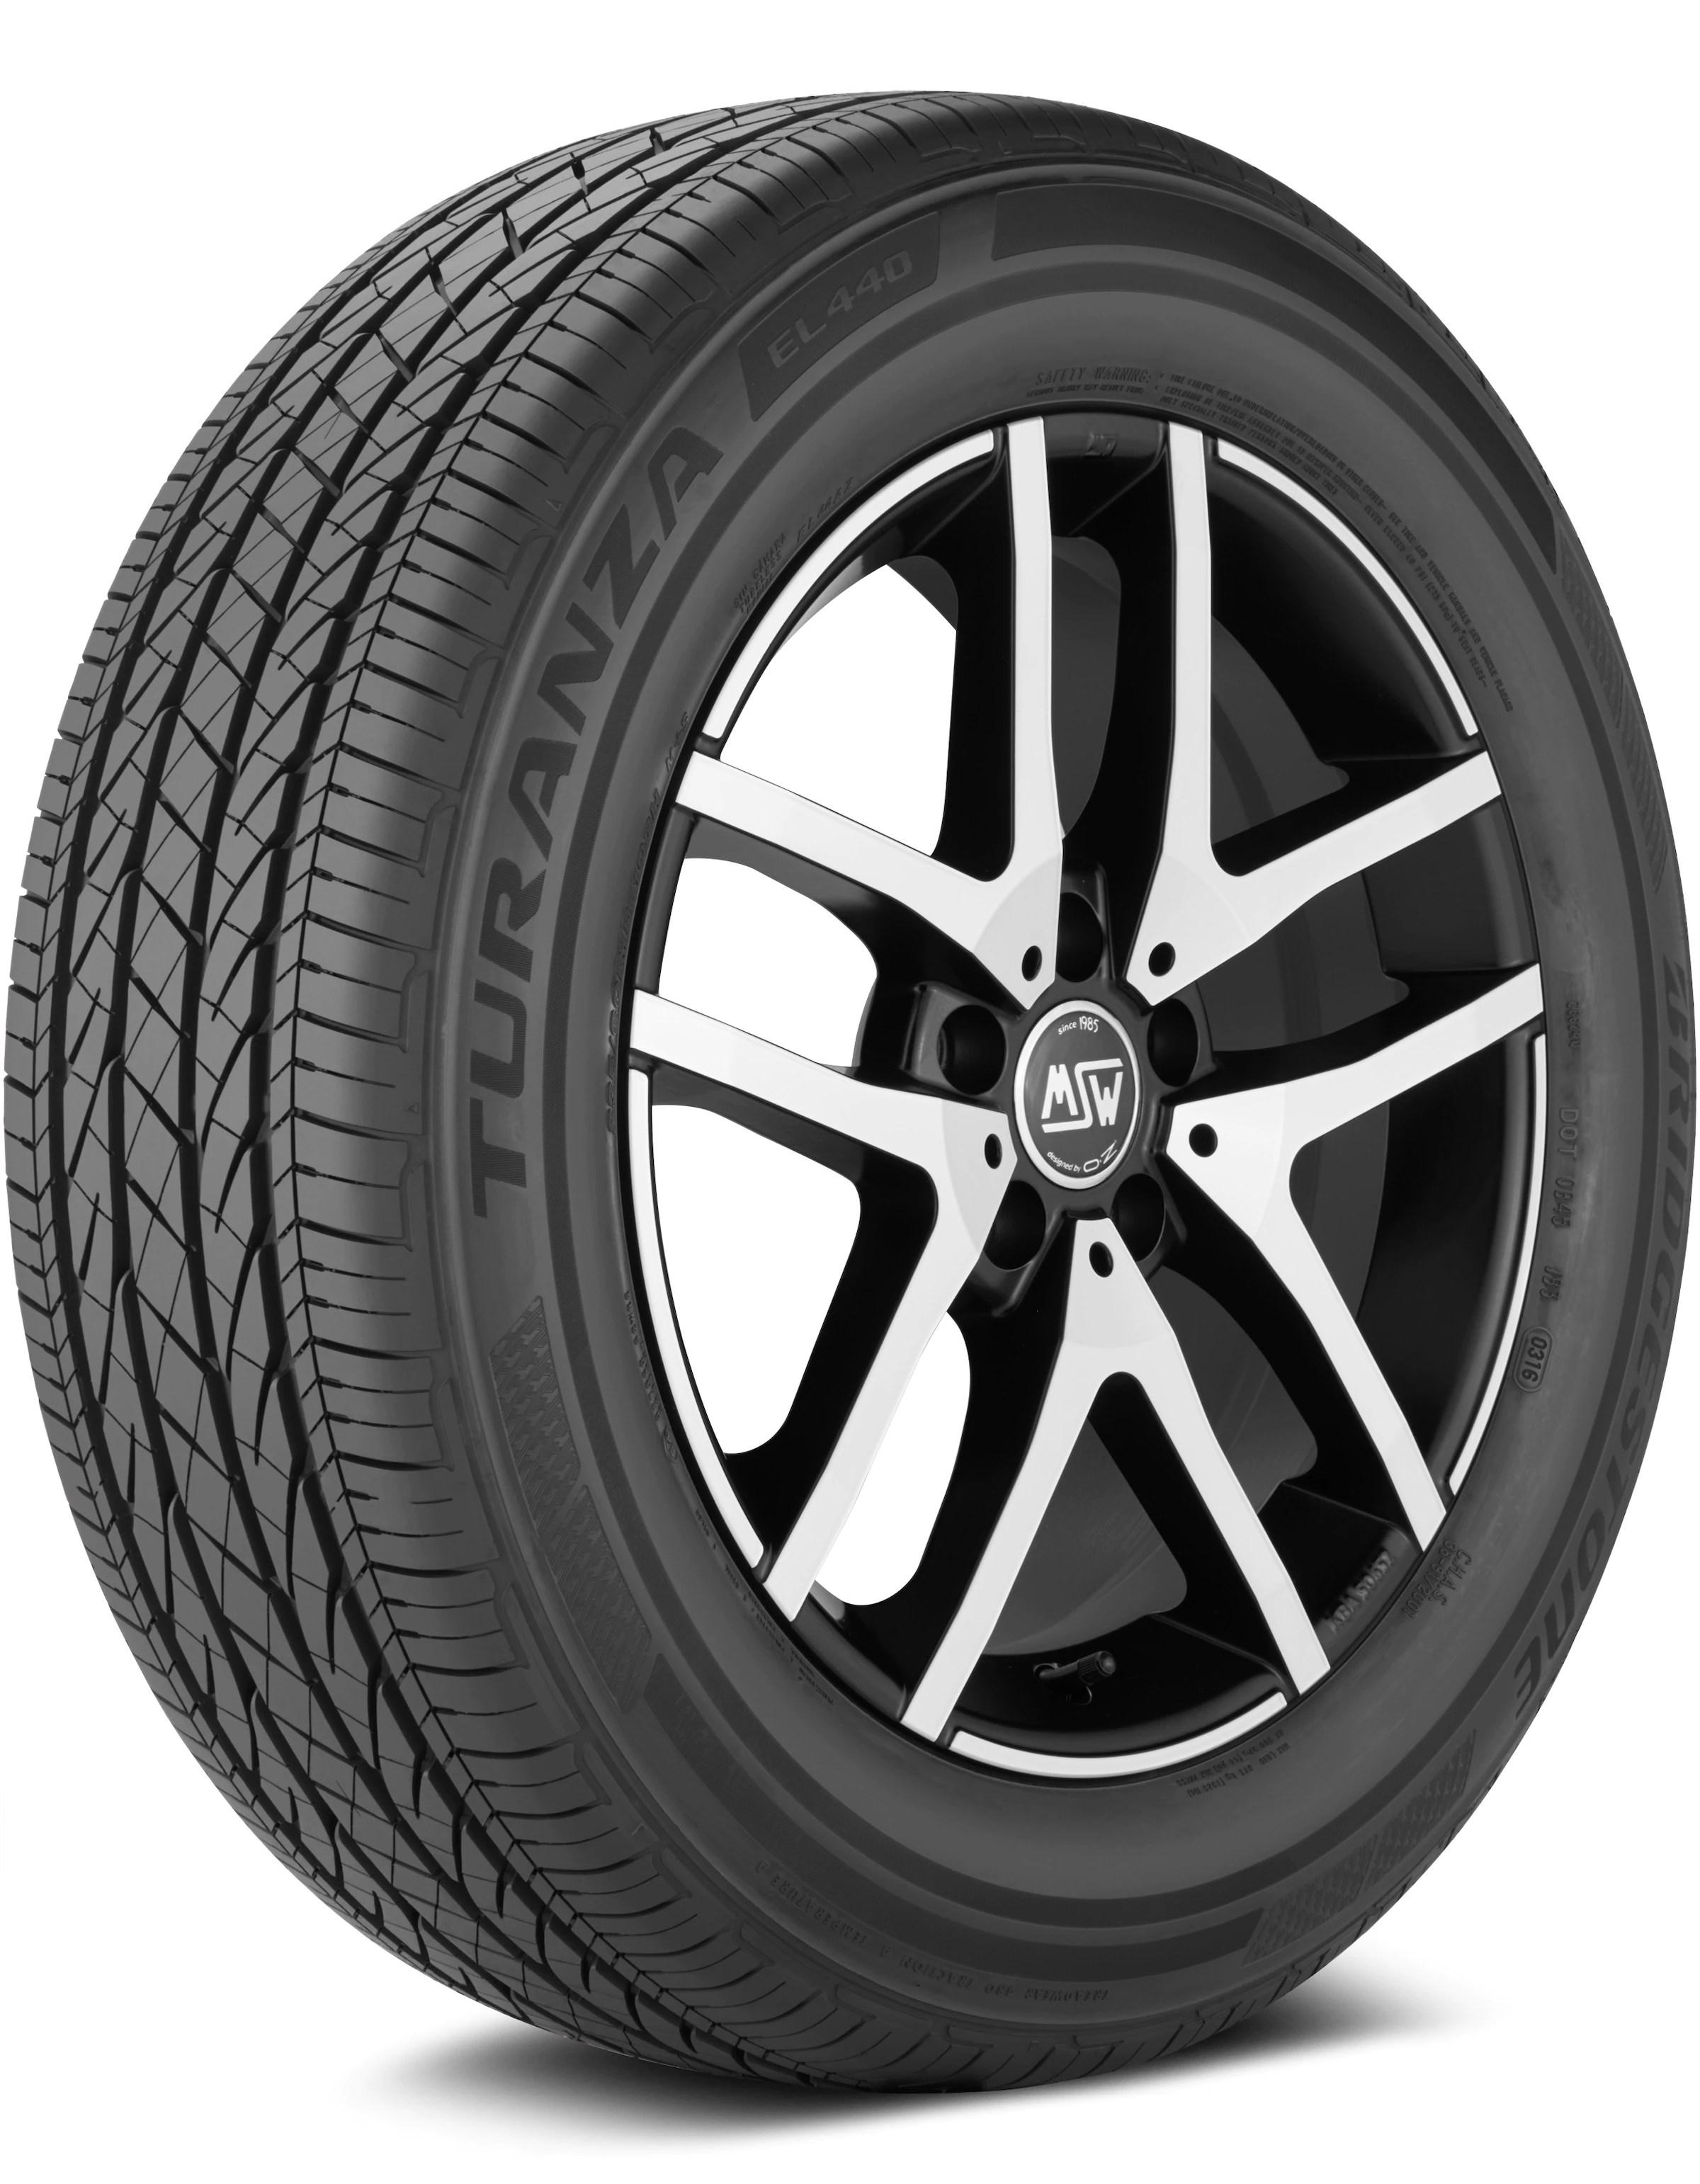 bridgestone turanza el440 235 45 18 tire